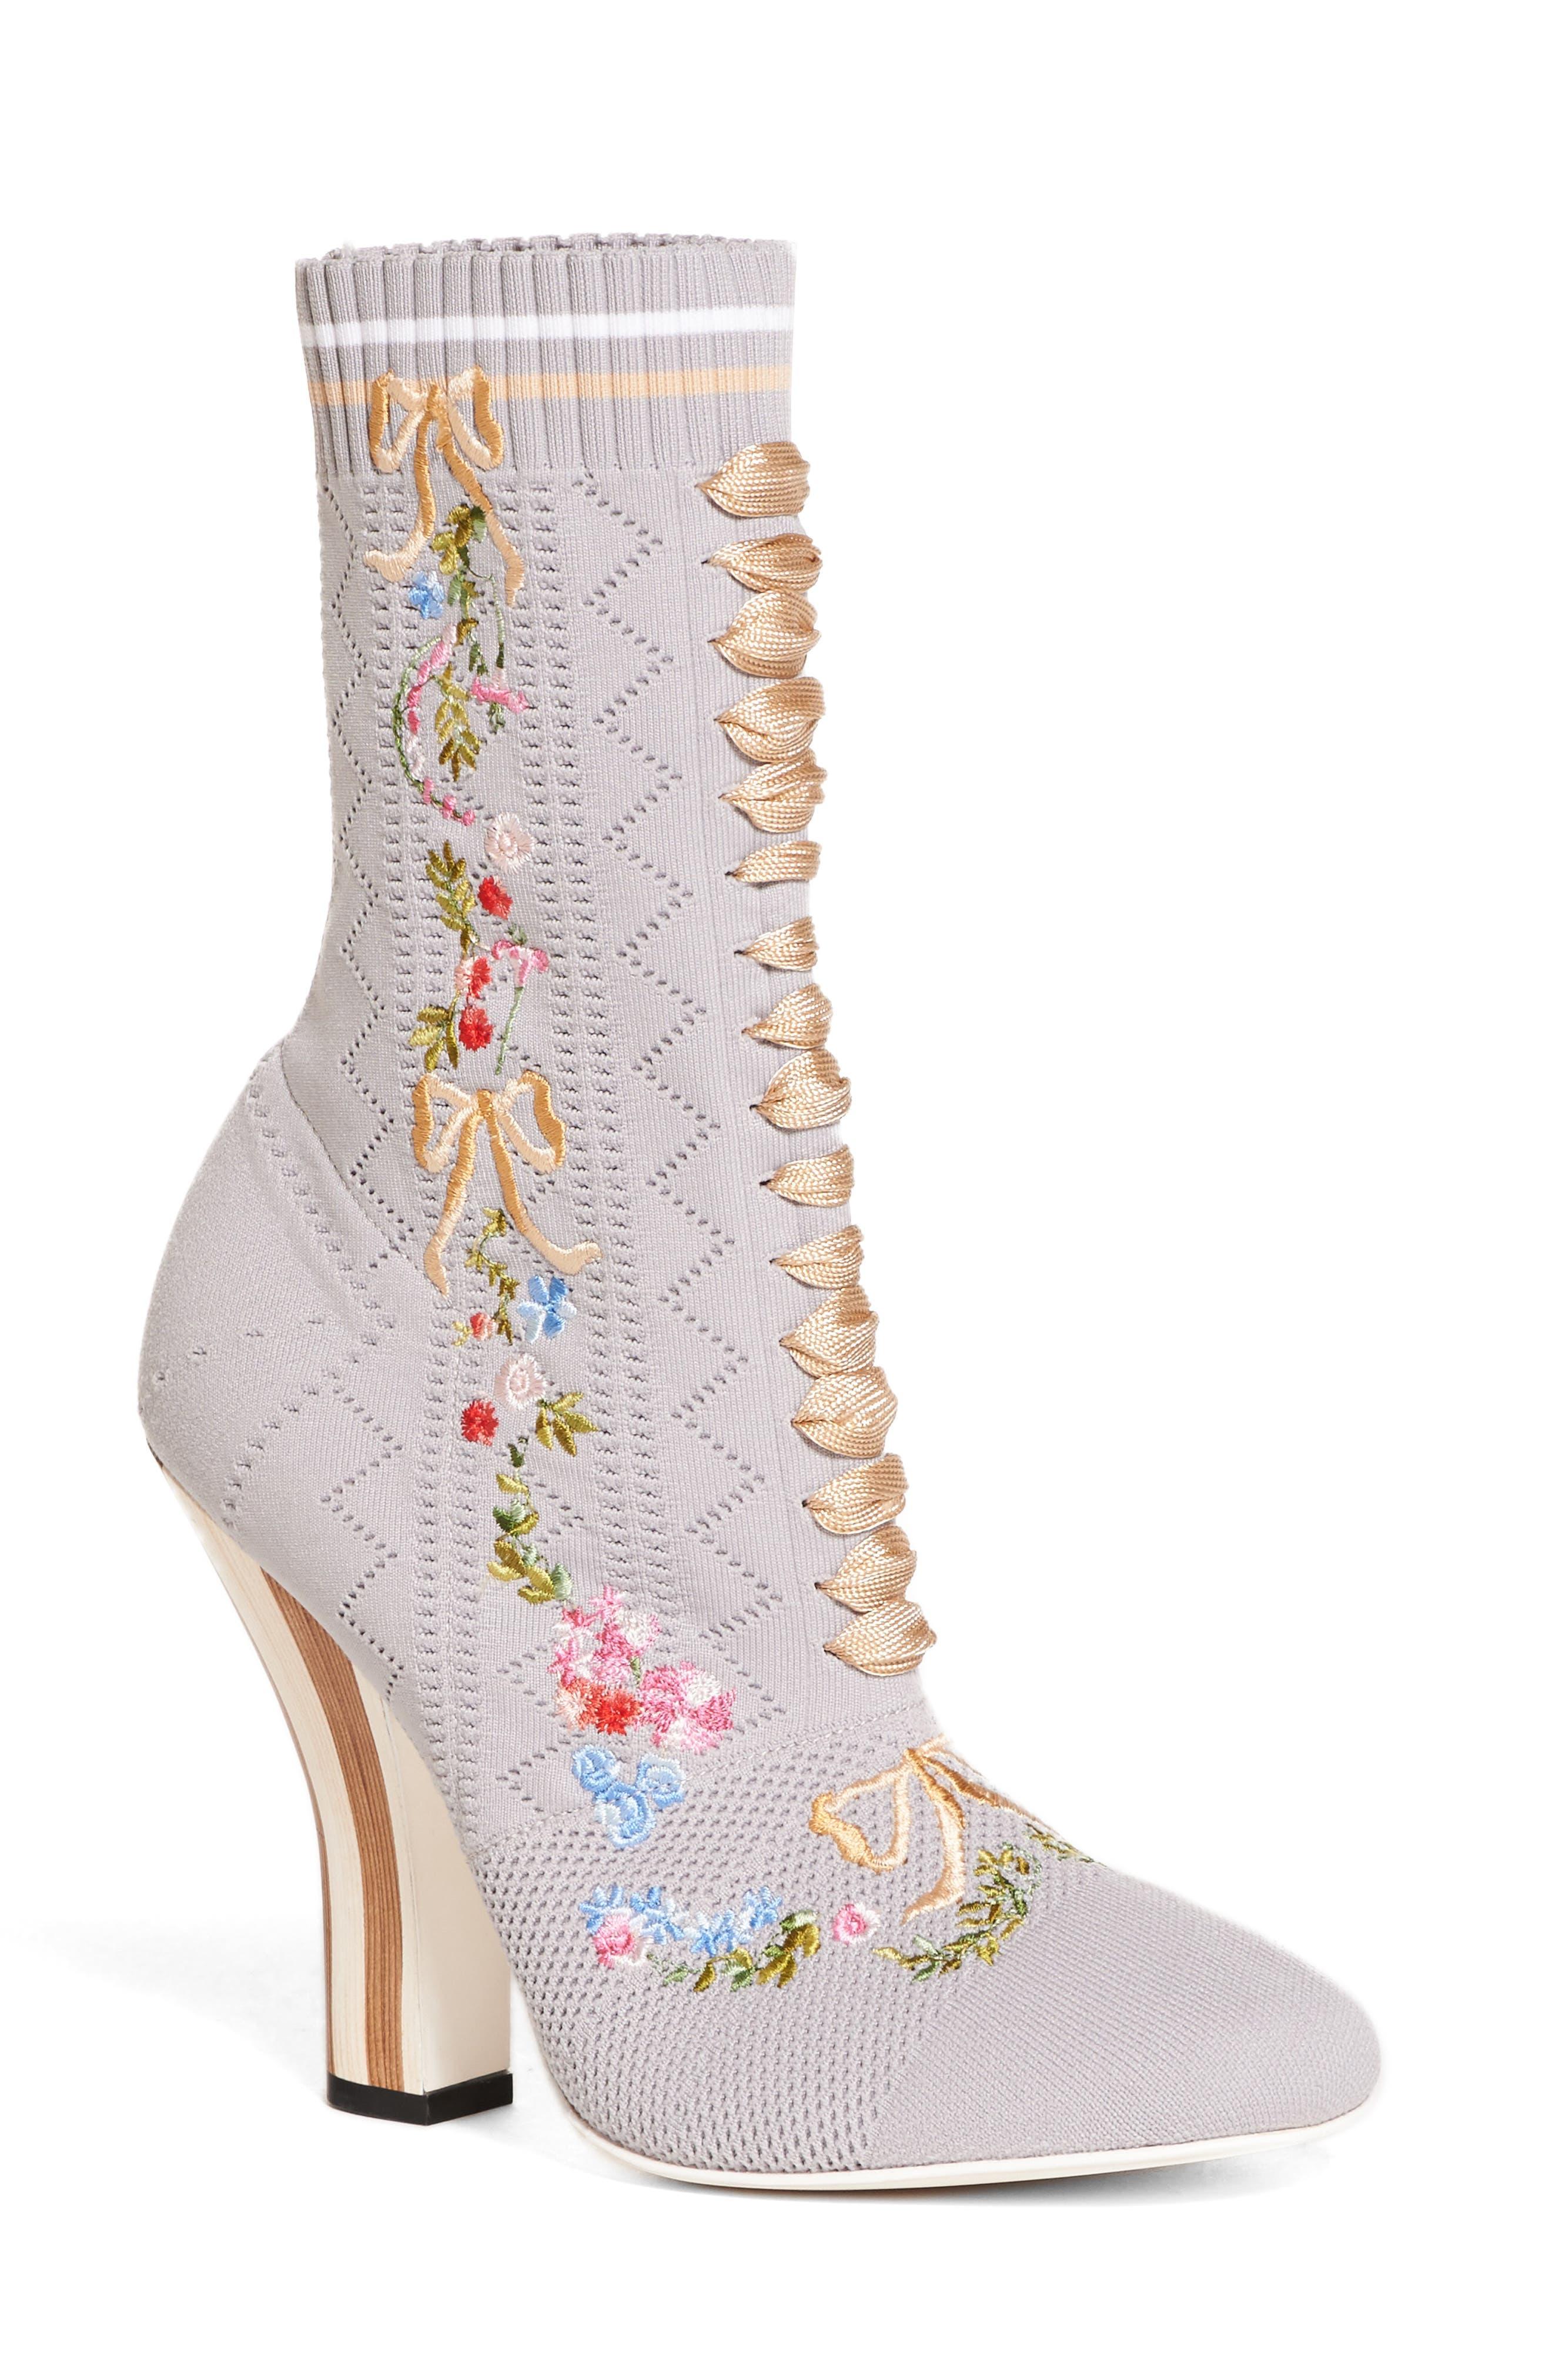 Alternate Image 1 Selected - Fendi Floral Sock Bootie (Women)